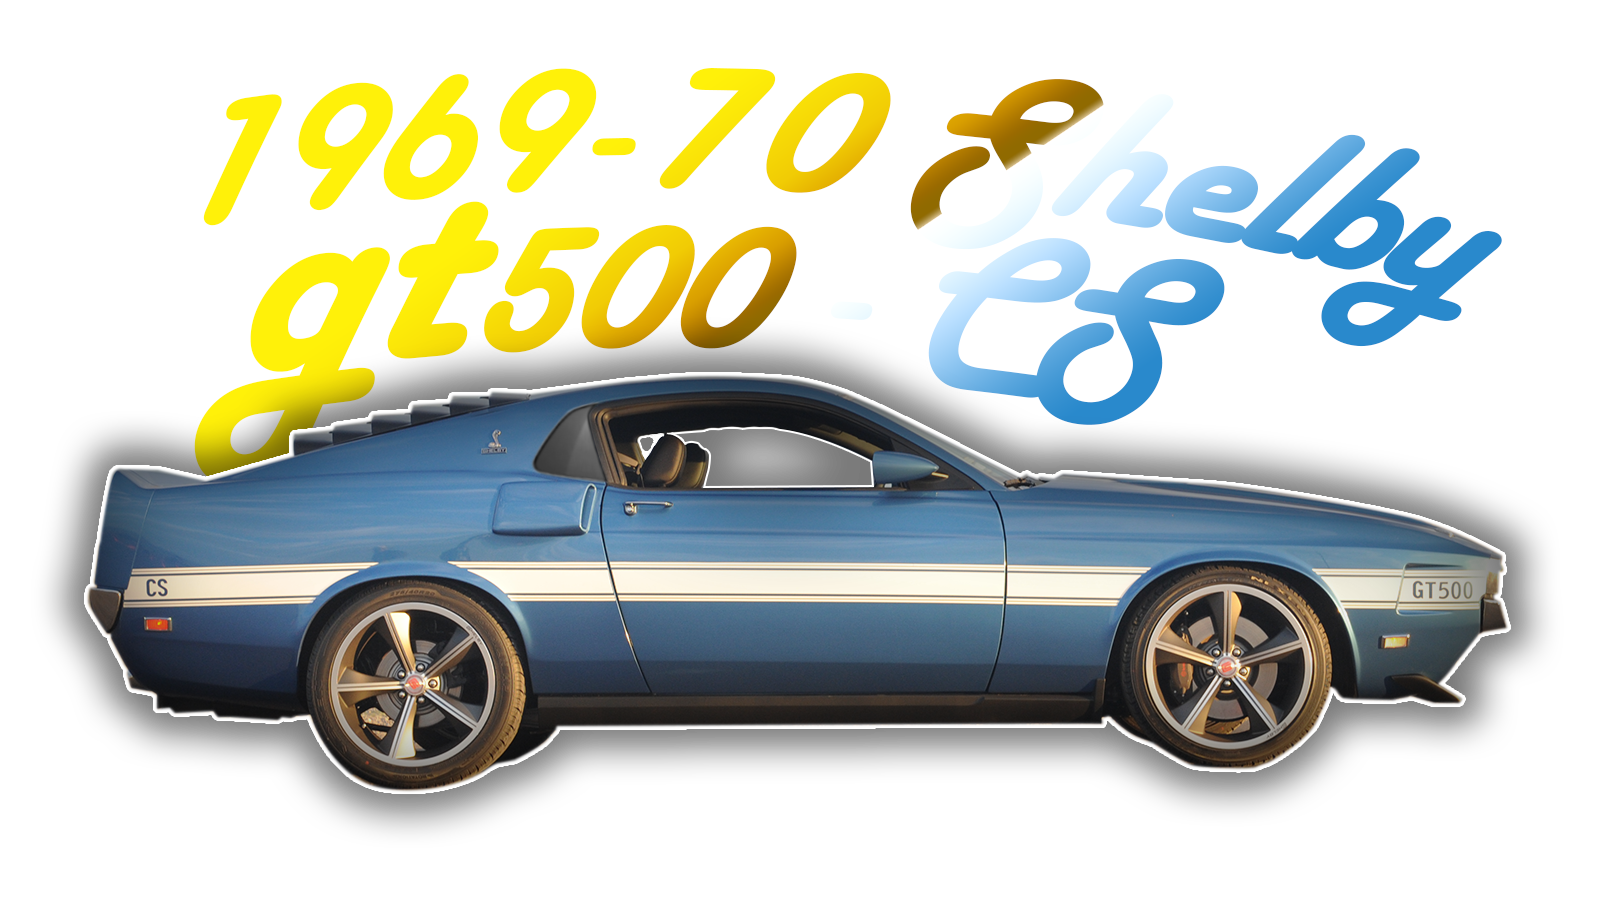 1969-70 Shelby GT500-CS